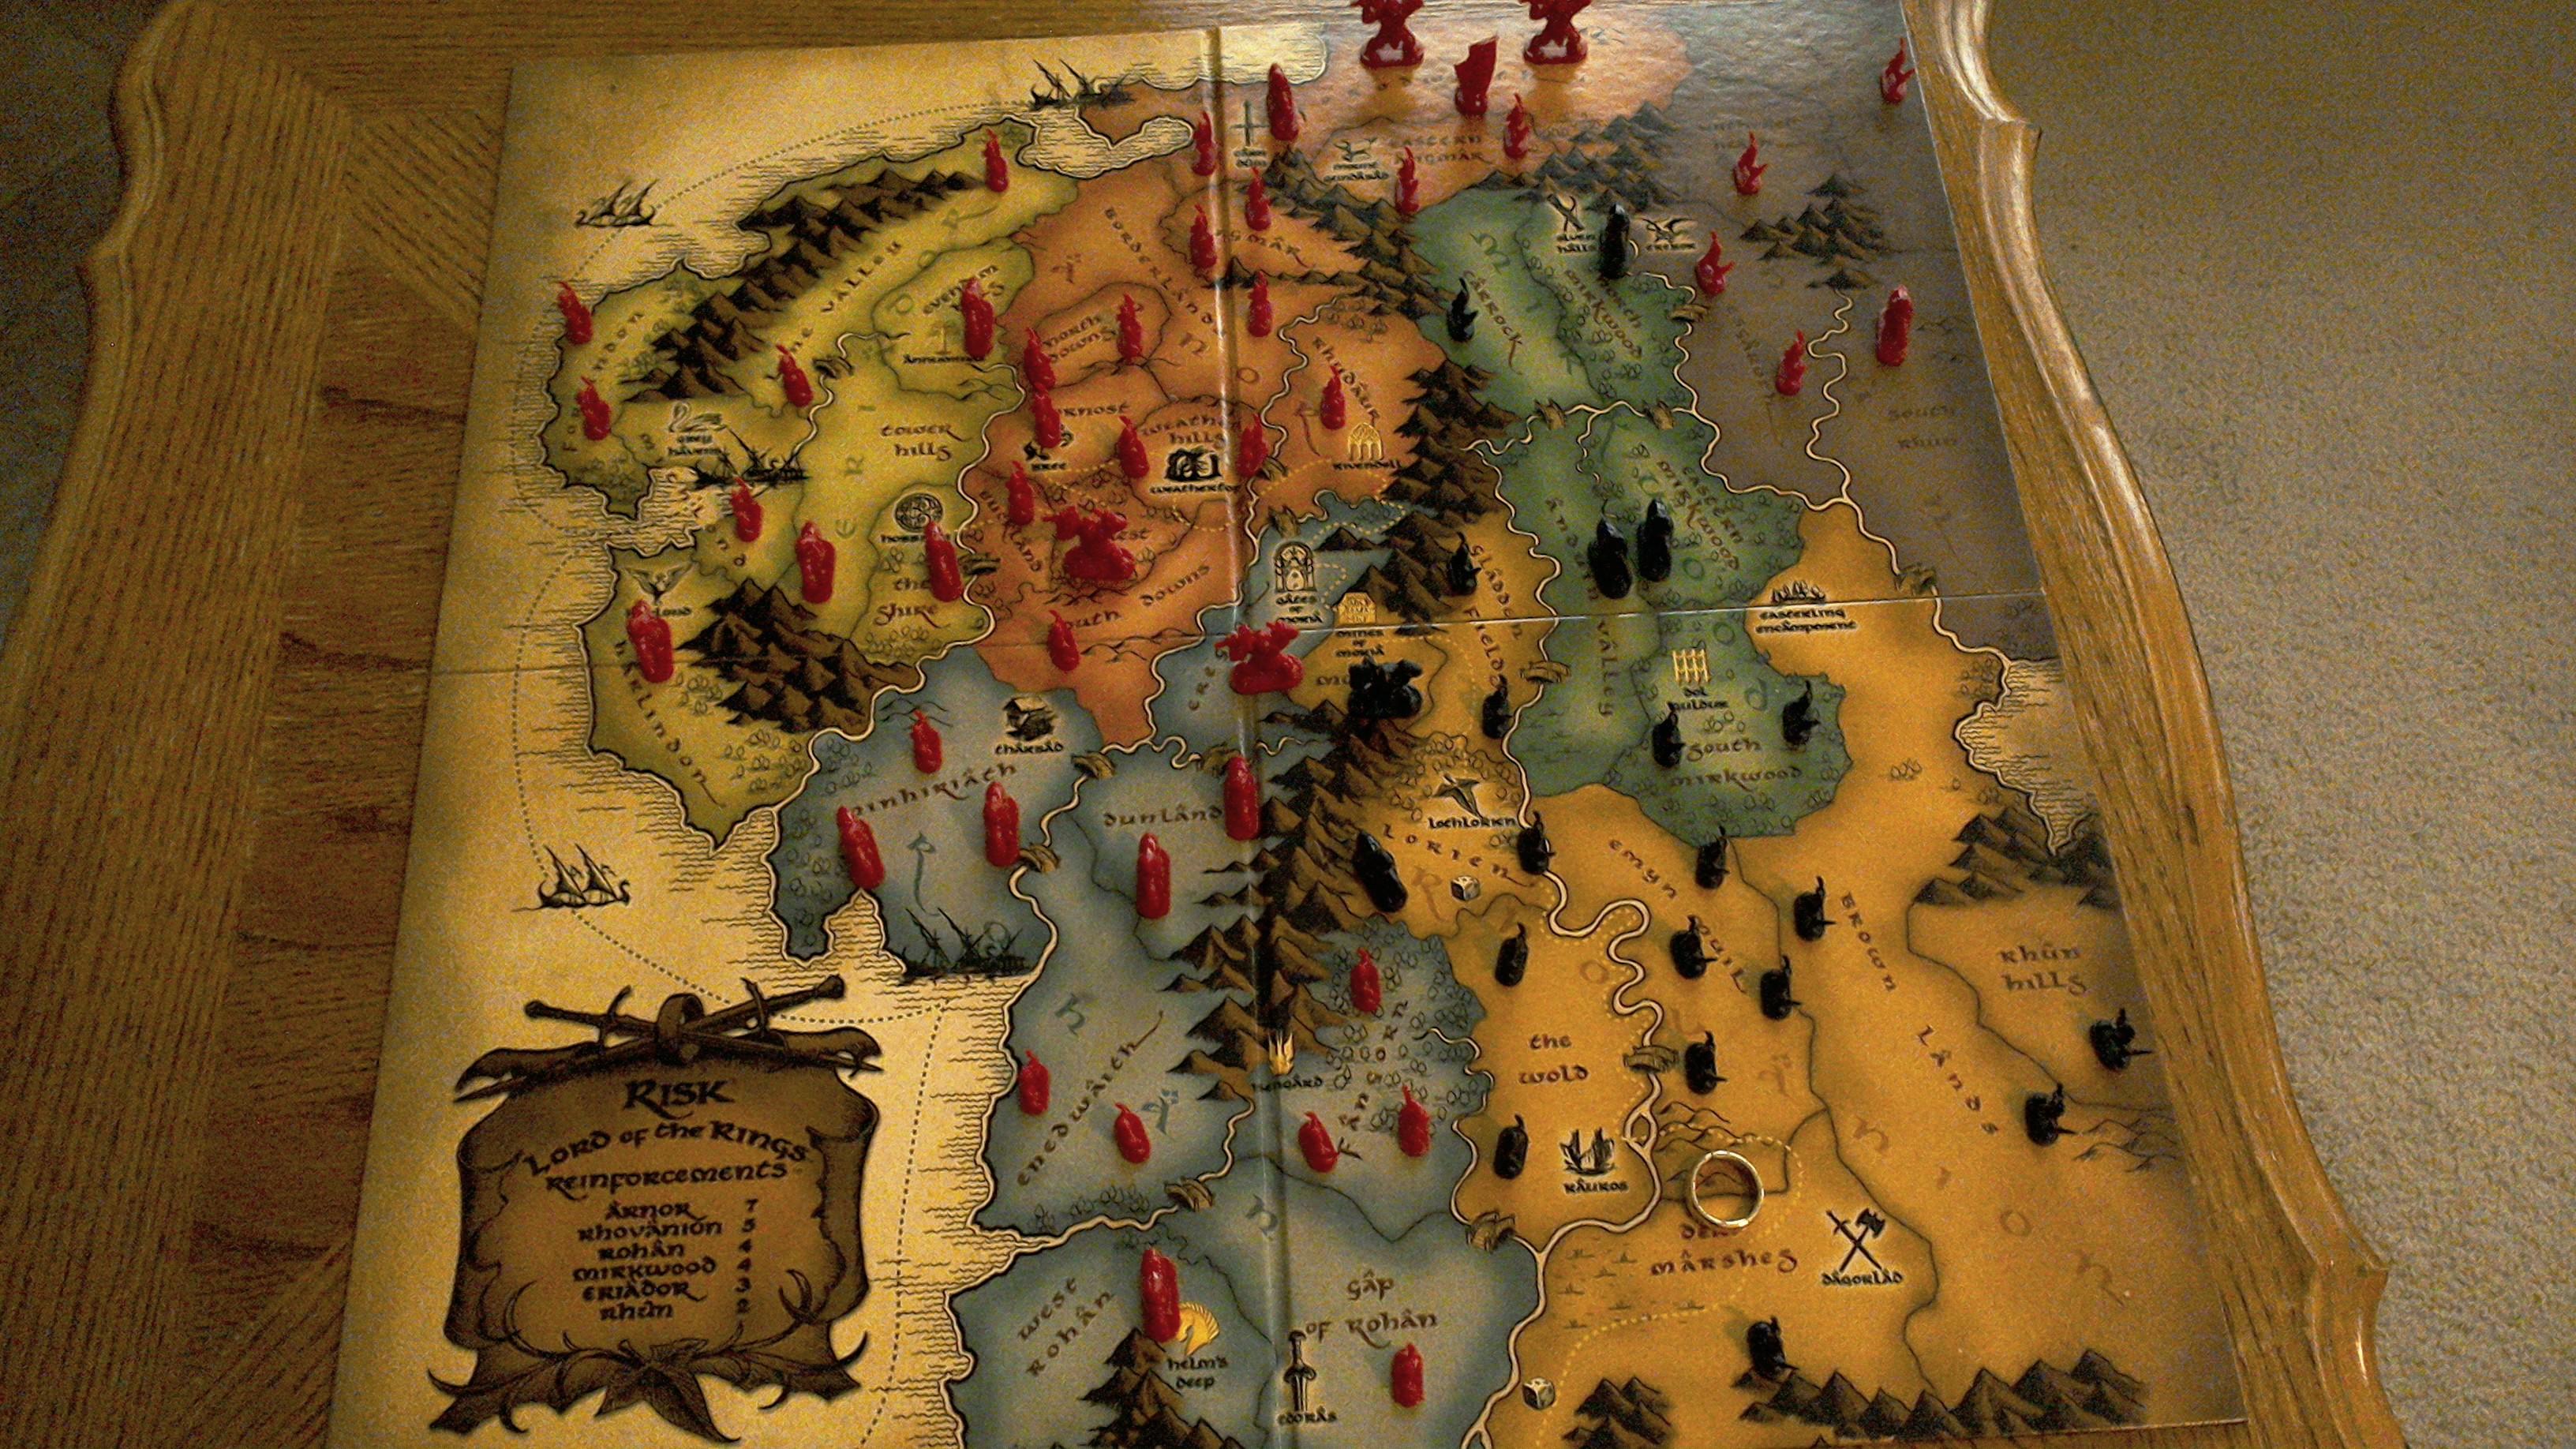 Beauhunt III/Dominion of Sauron